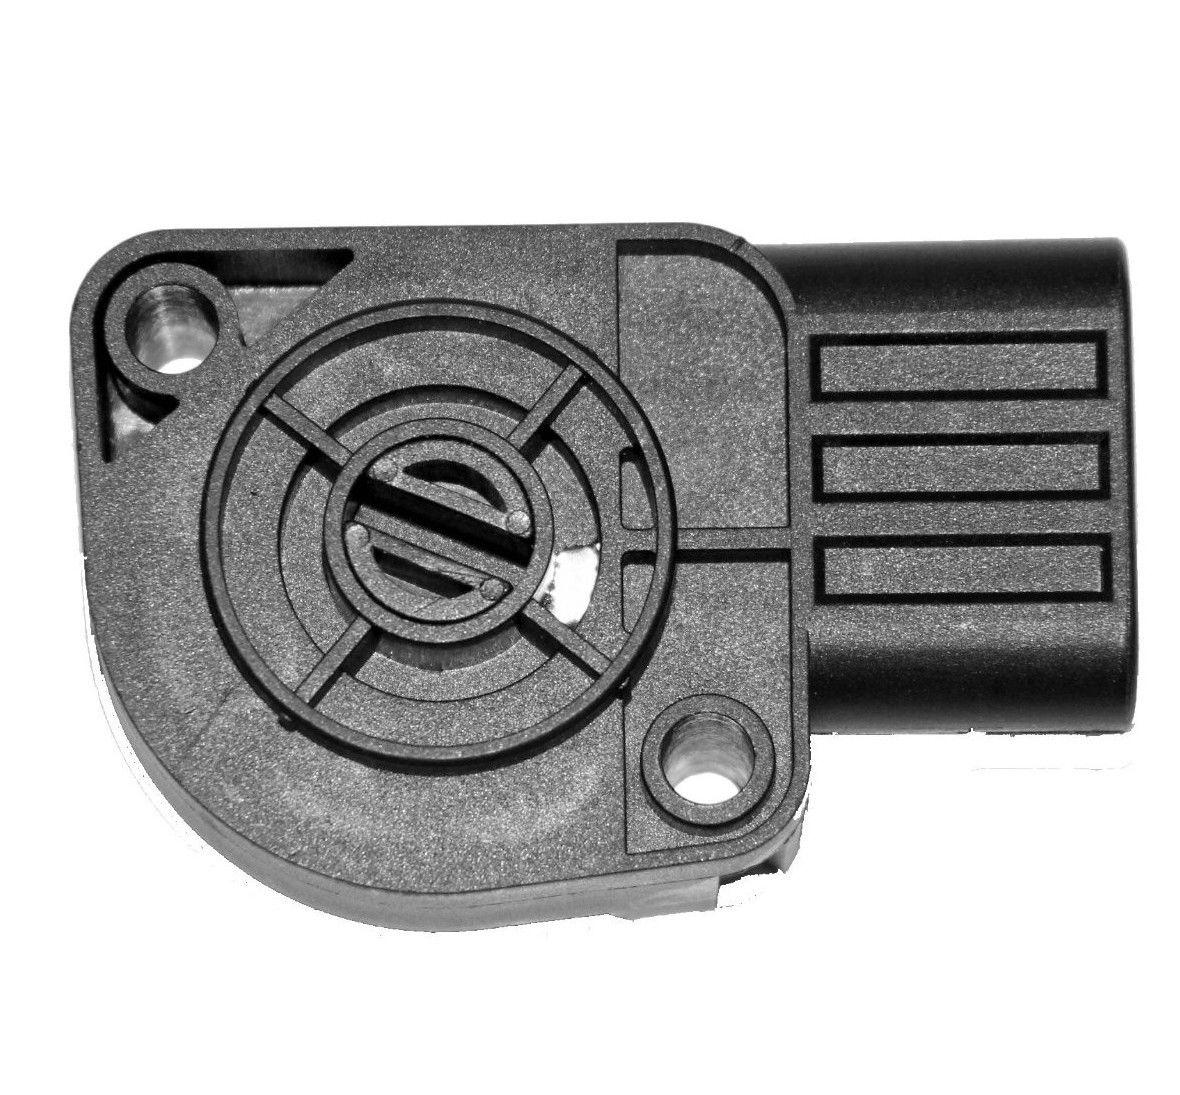 Tps Throttle Position Sensor Only Fits Dodge Ram Cummins 98 04 Bell Together With Crankshaft Location On Add To Wishlist Loading